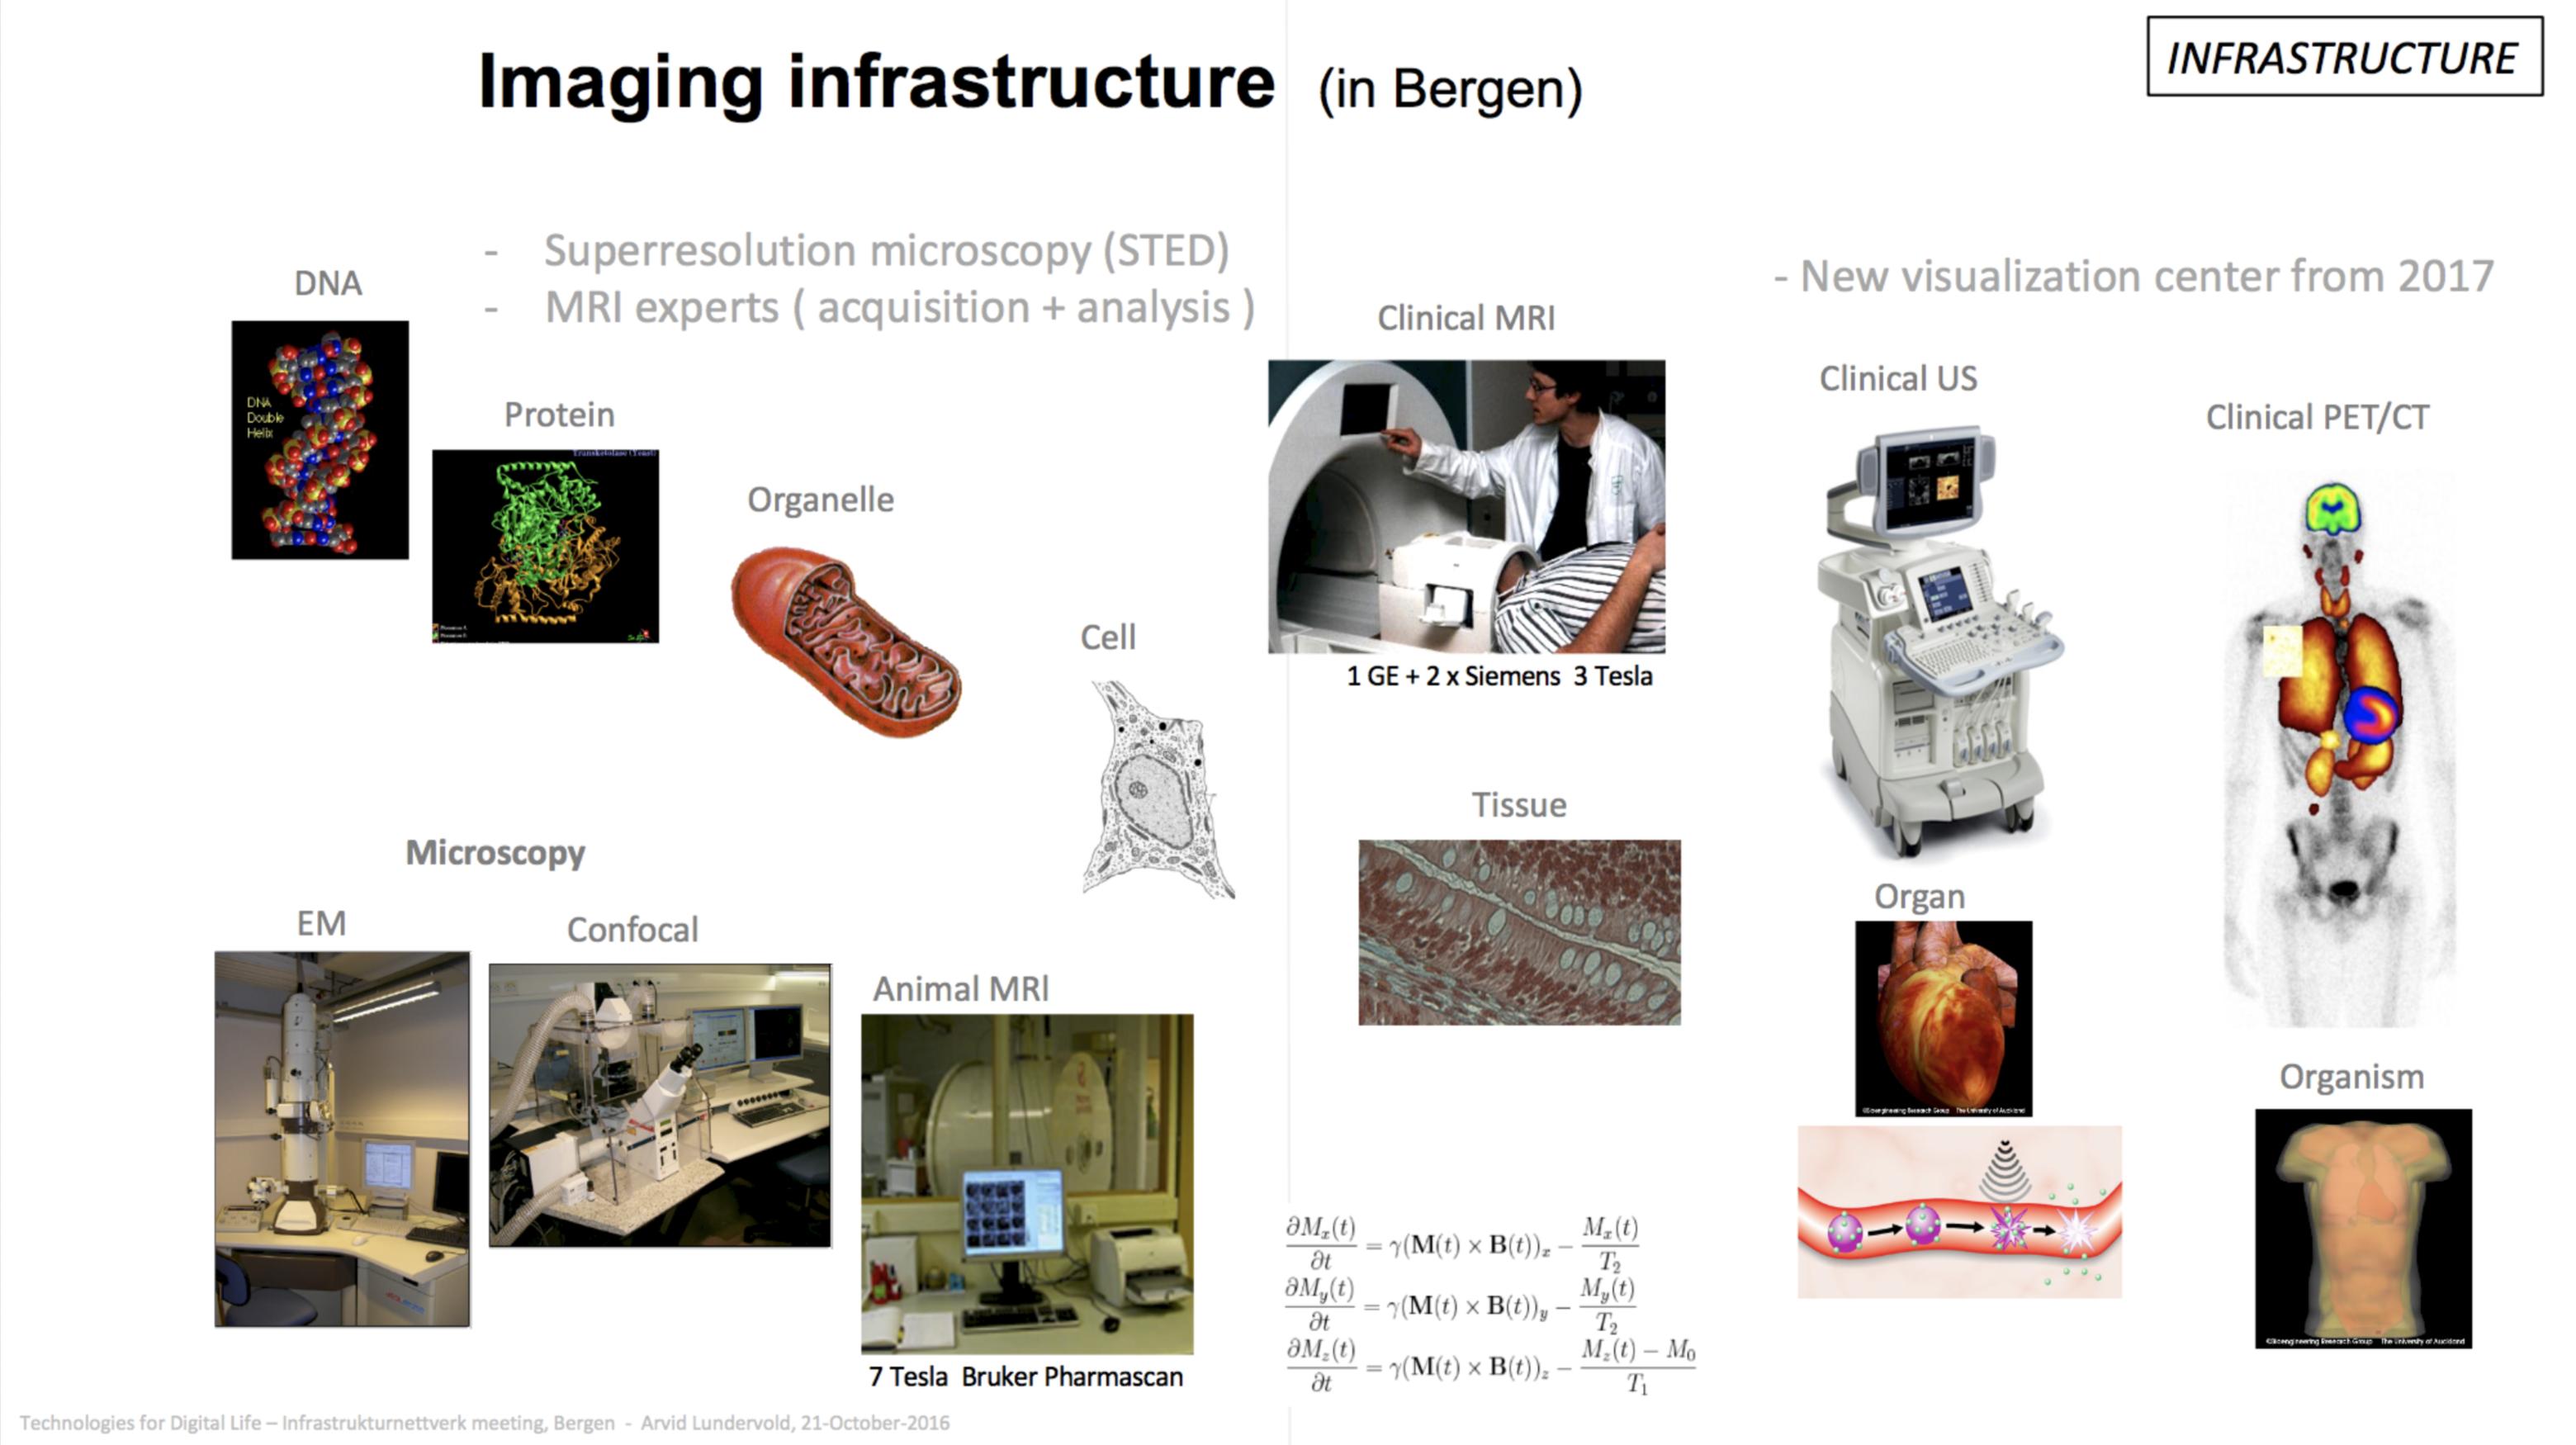 Infrastructure Bergen